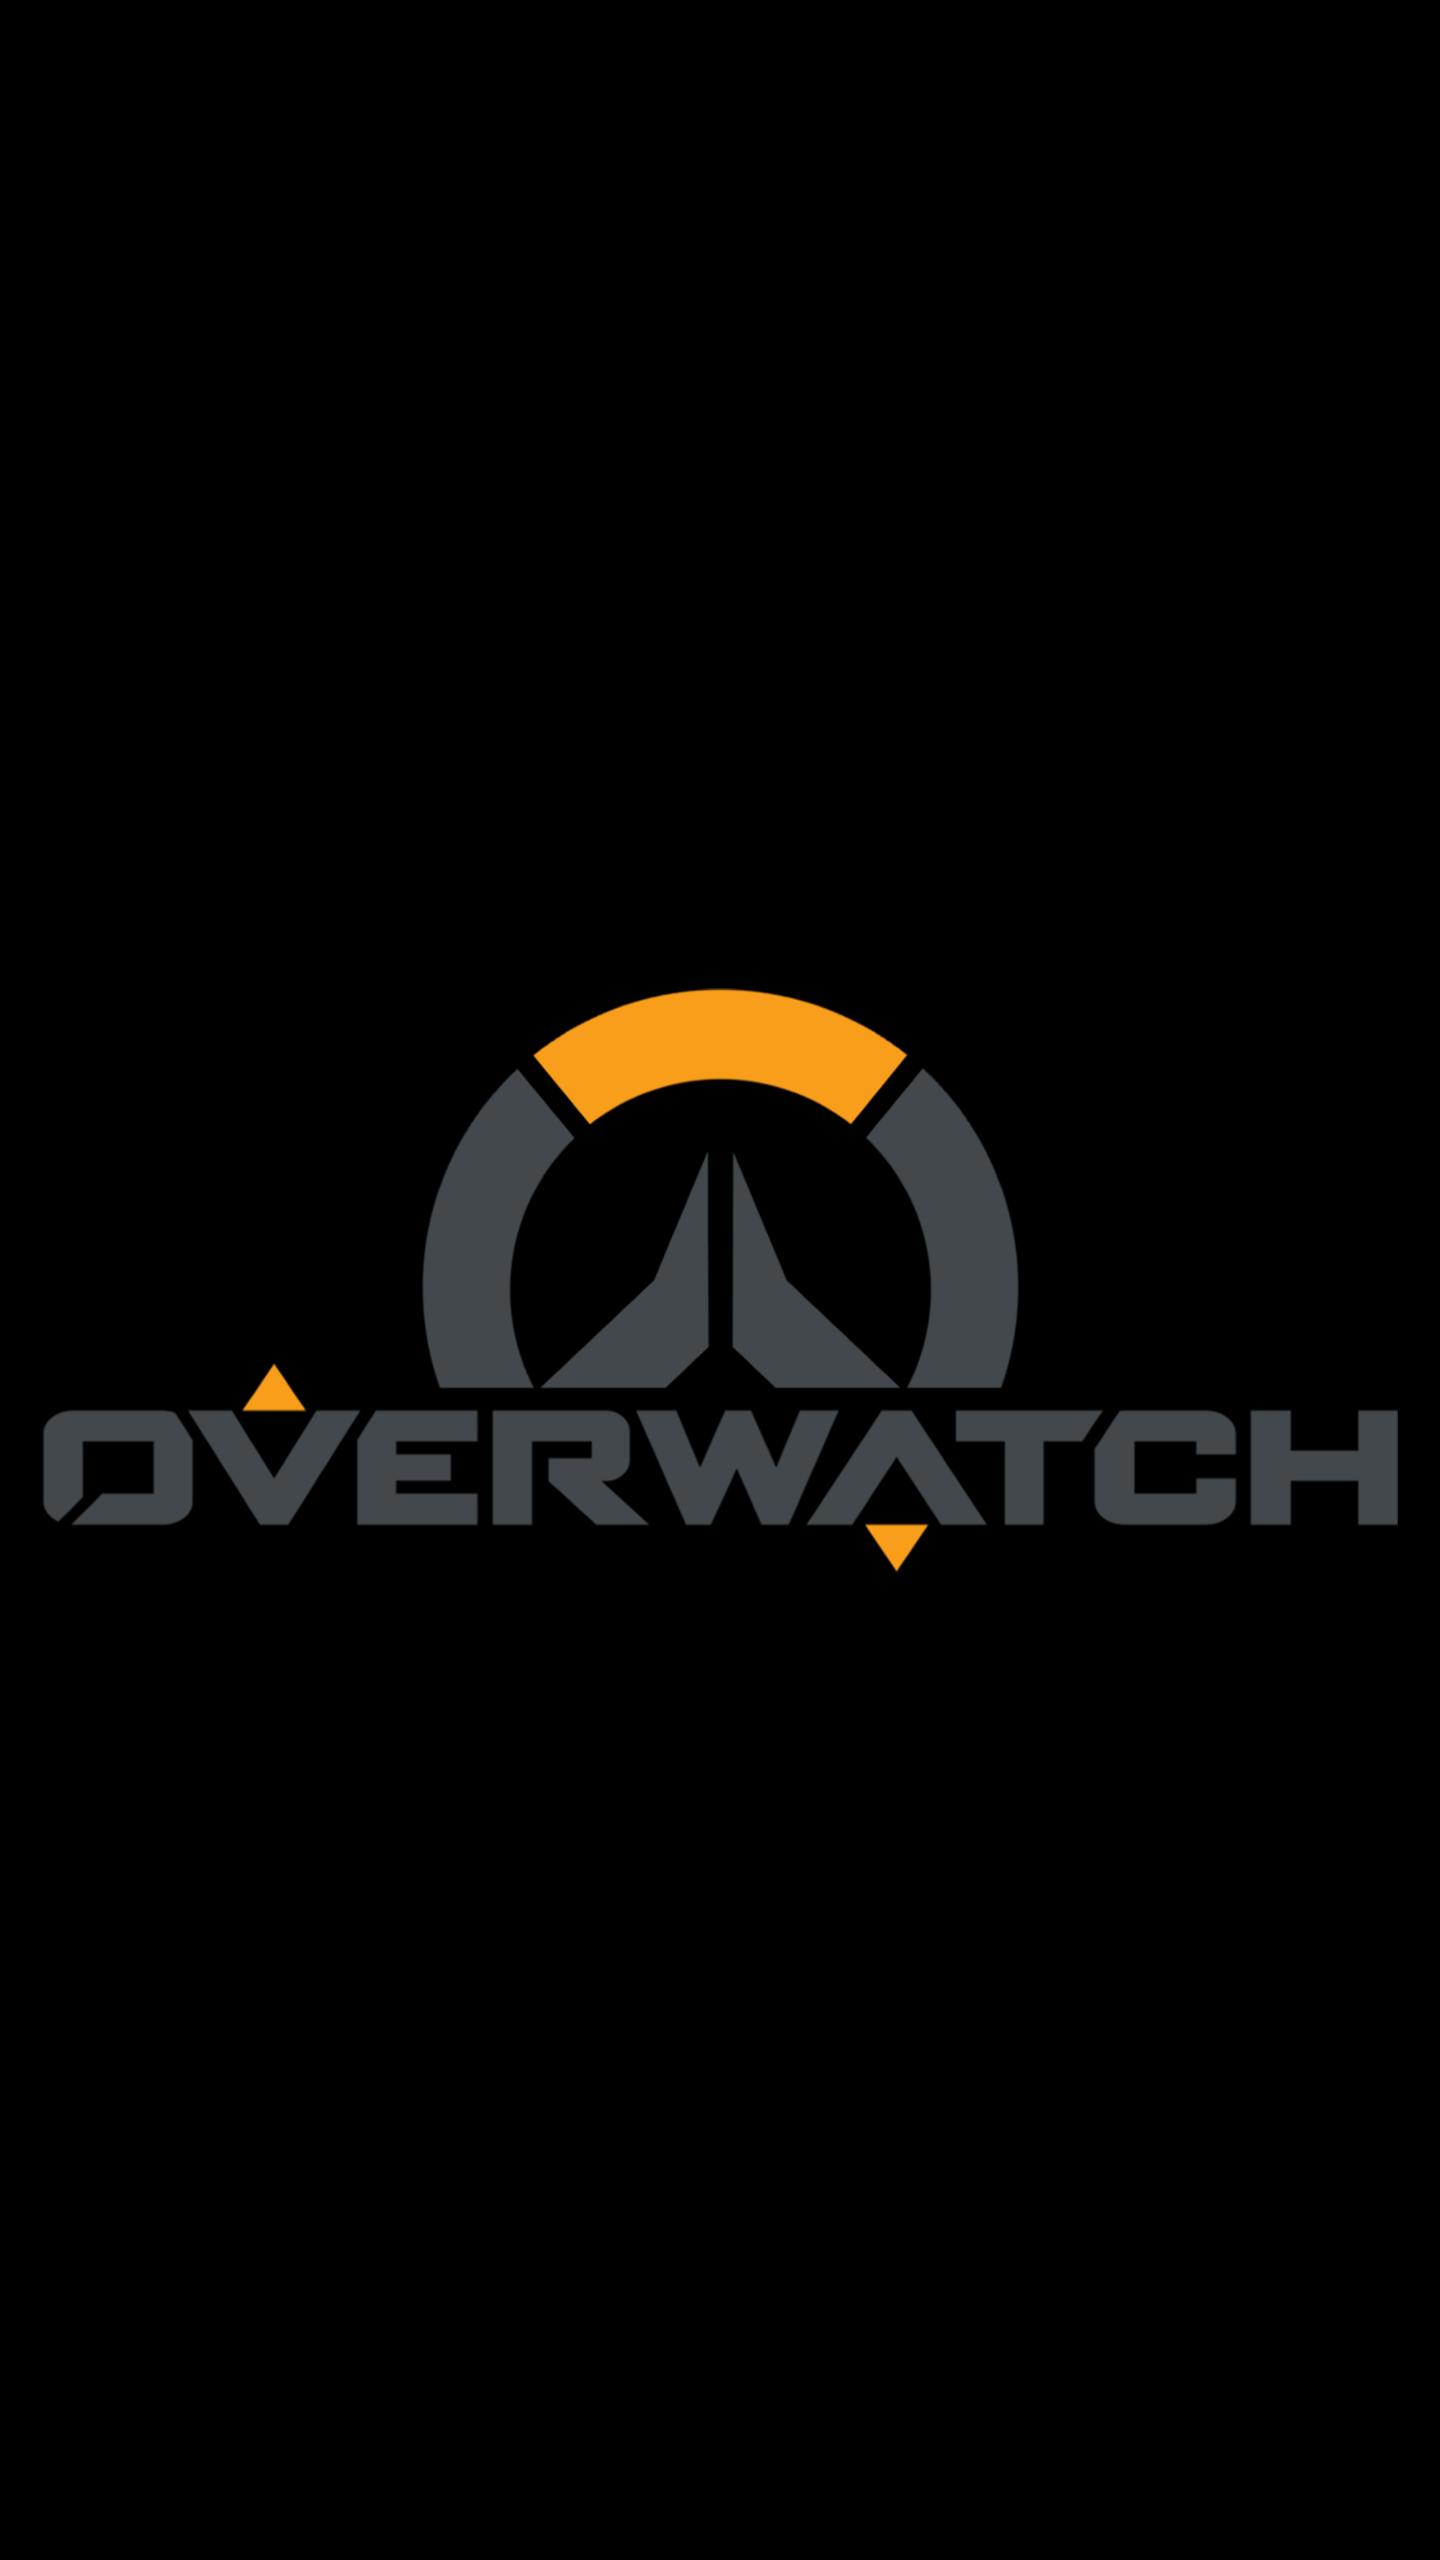 Free Download Overwatch Simple Logo Wallpaper 1440x2560